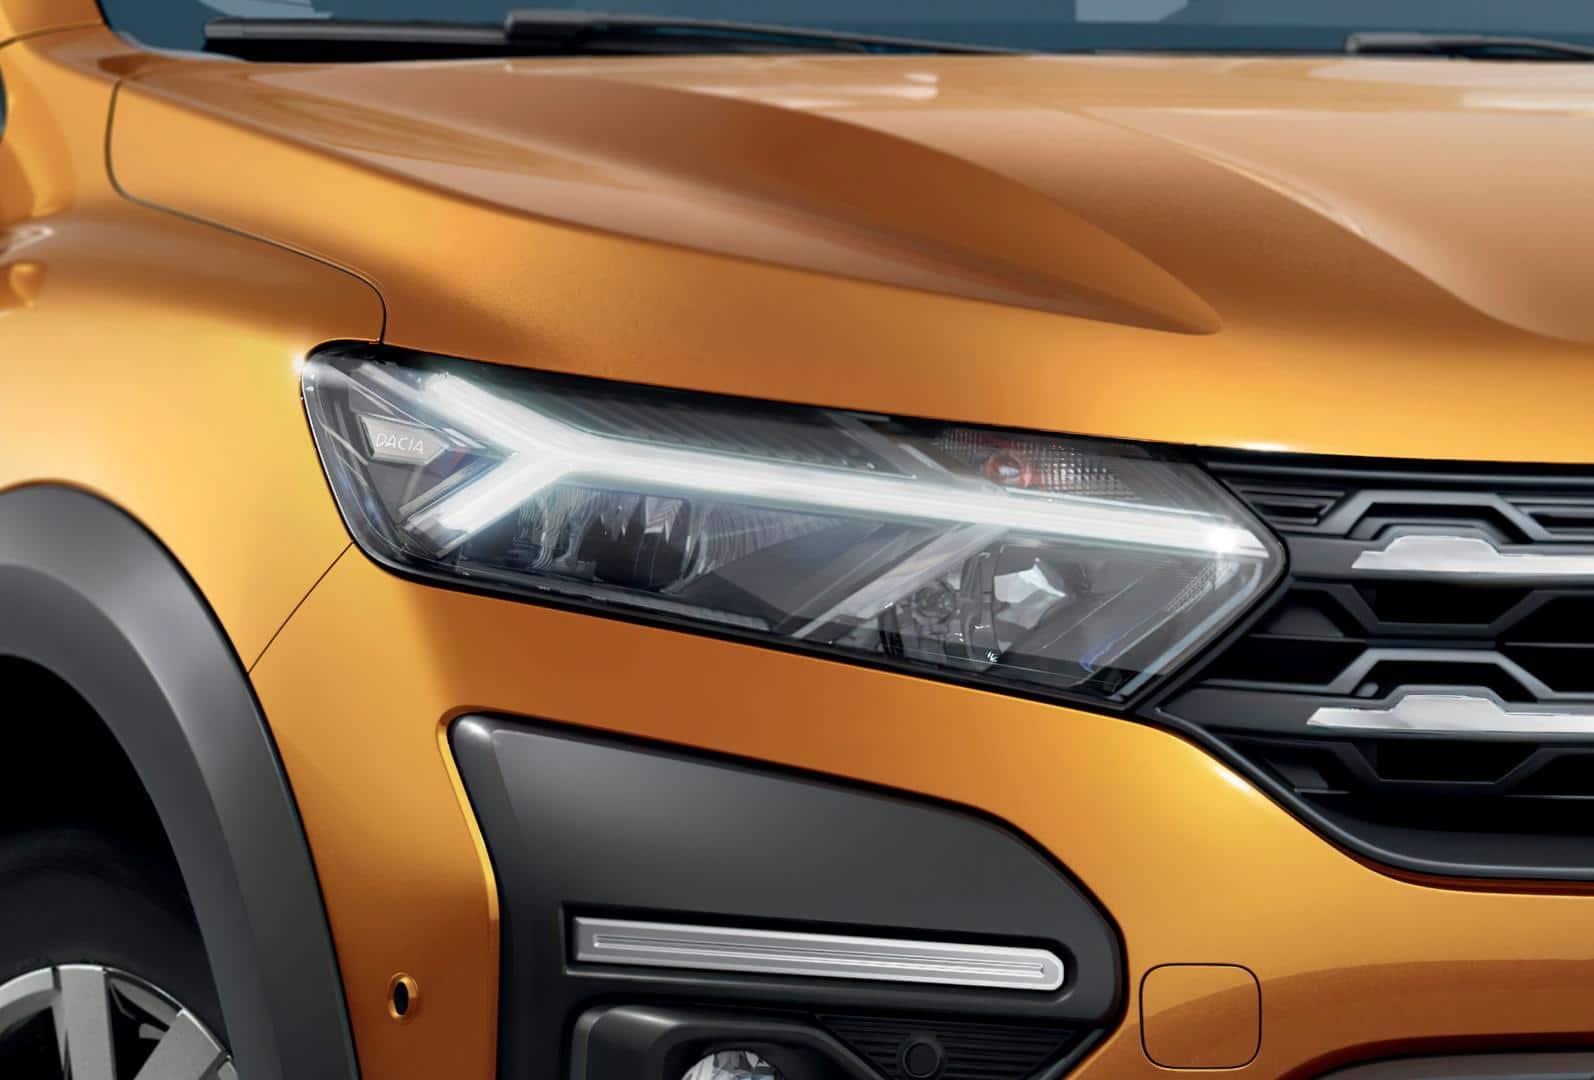 Neue Dacia Lichtsignatur beim Dacia SANDERO STEPWAY Autohaus Schouren